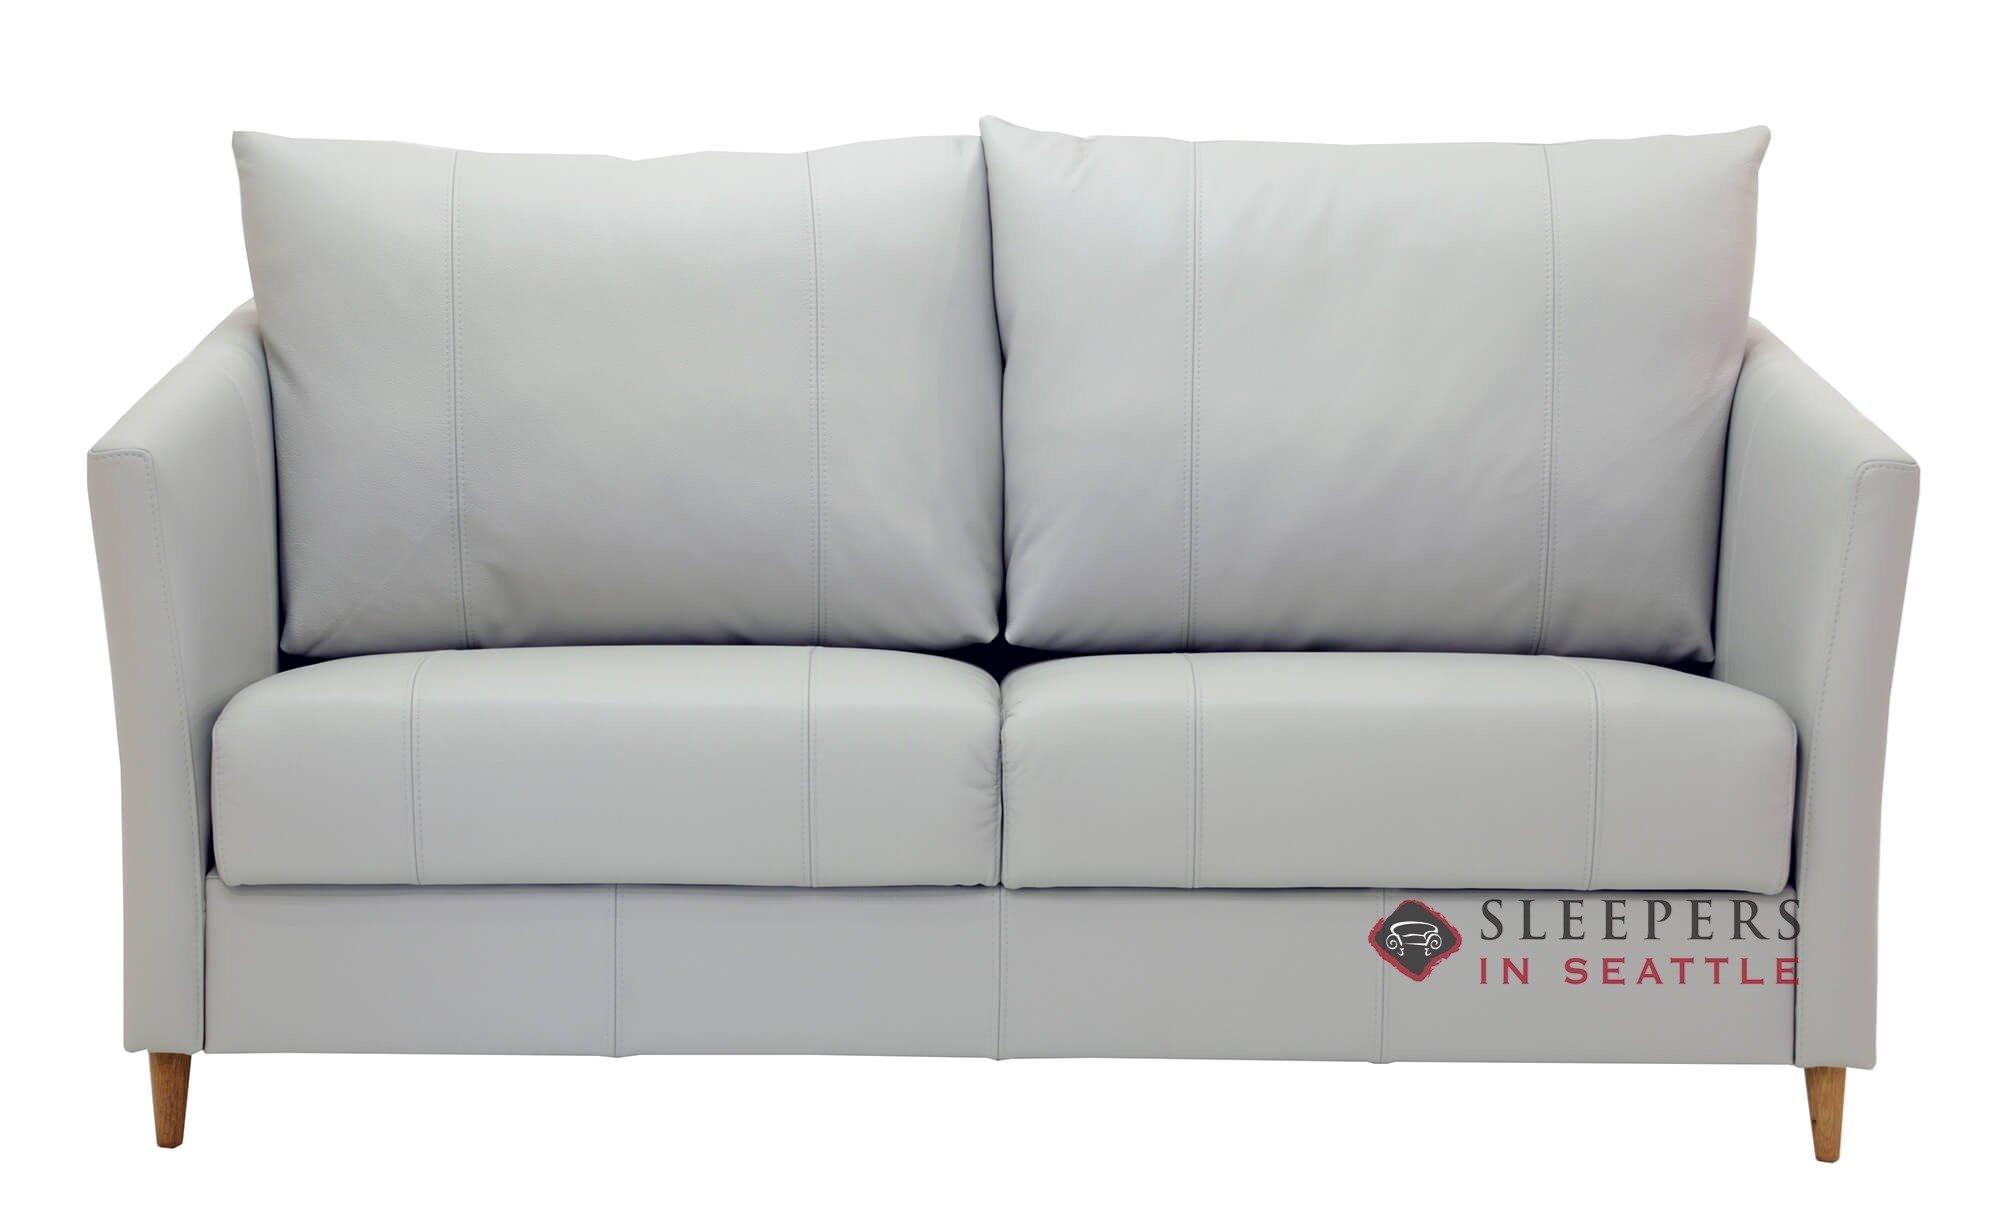 Luonto Erika Queen Leather Sleeper Sofa